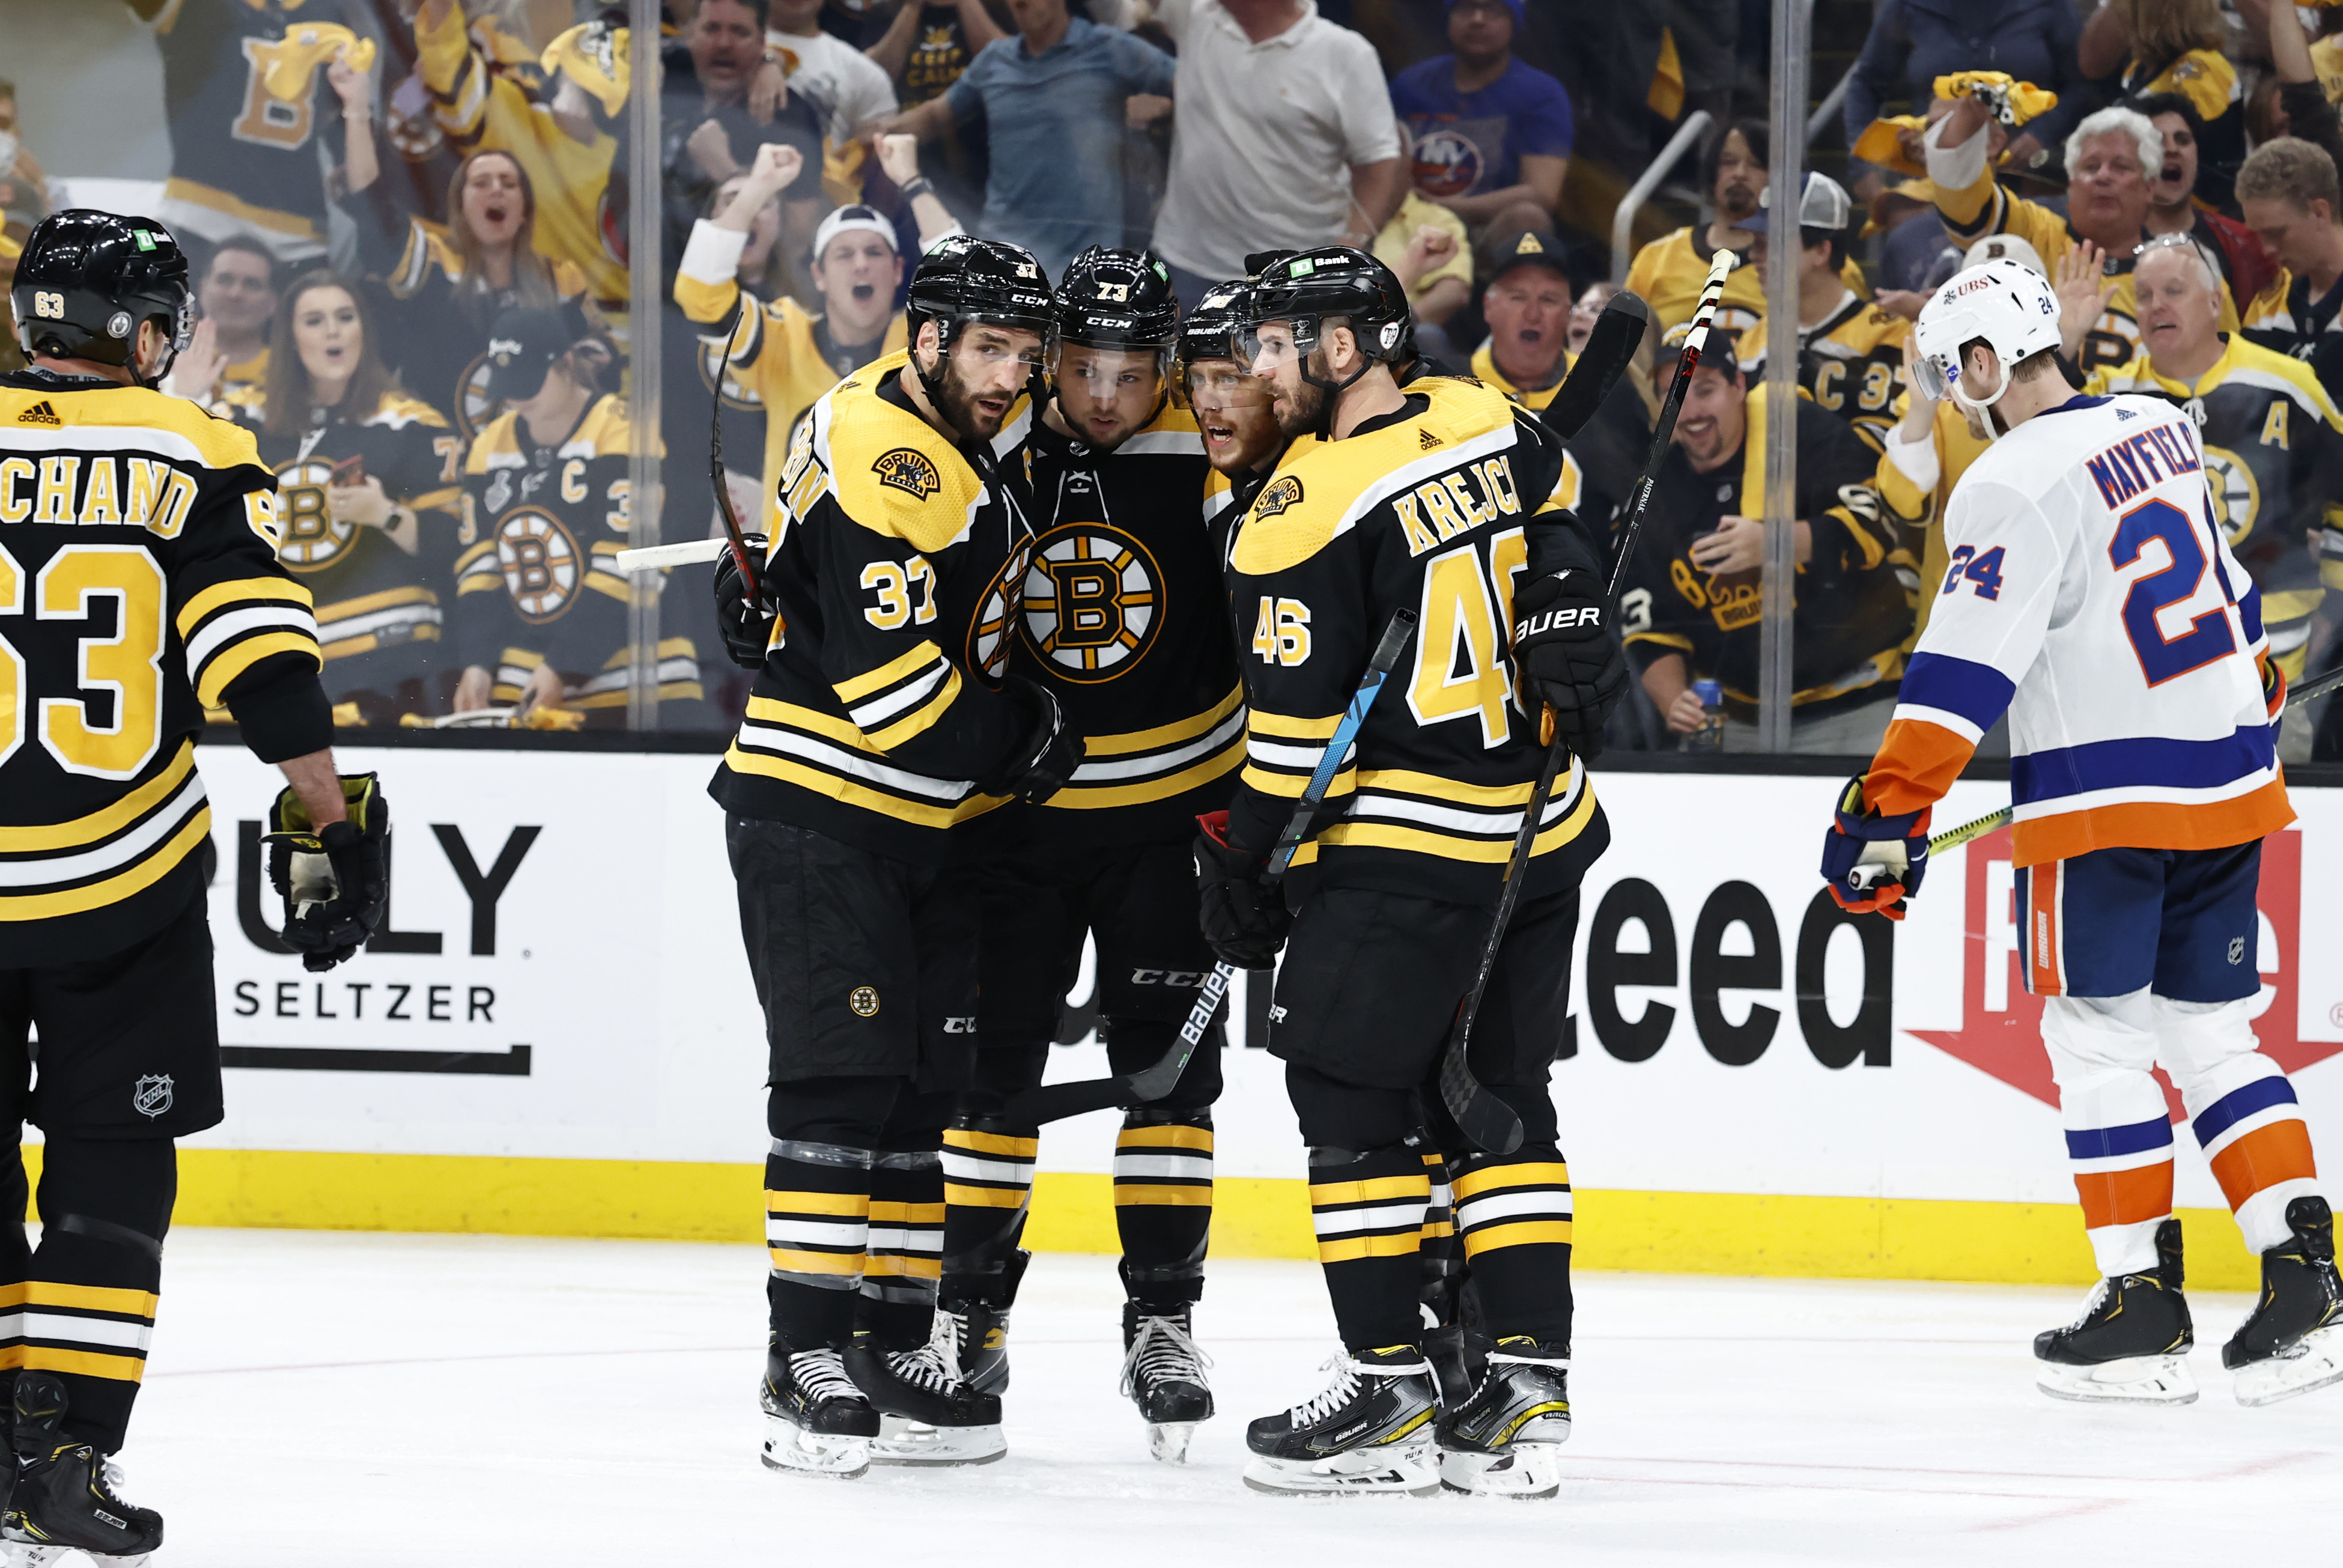 NHL: JUN 07 Stanley Cup Playoffs Second Round - Islanders at Bruins